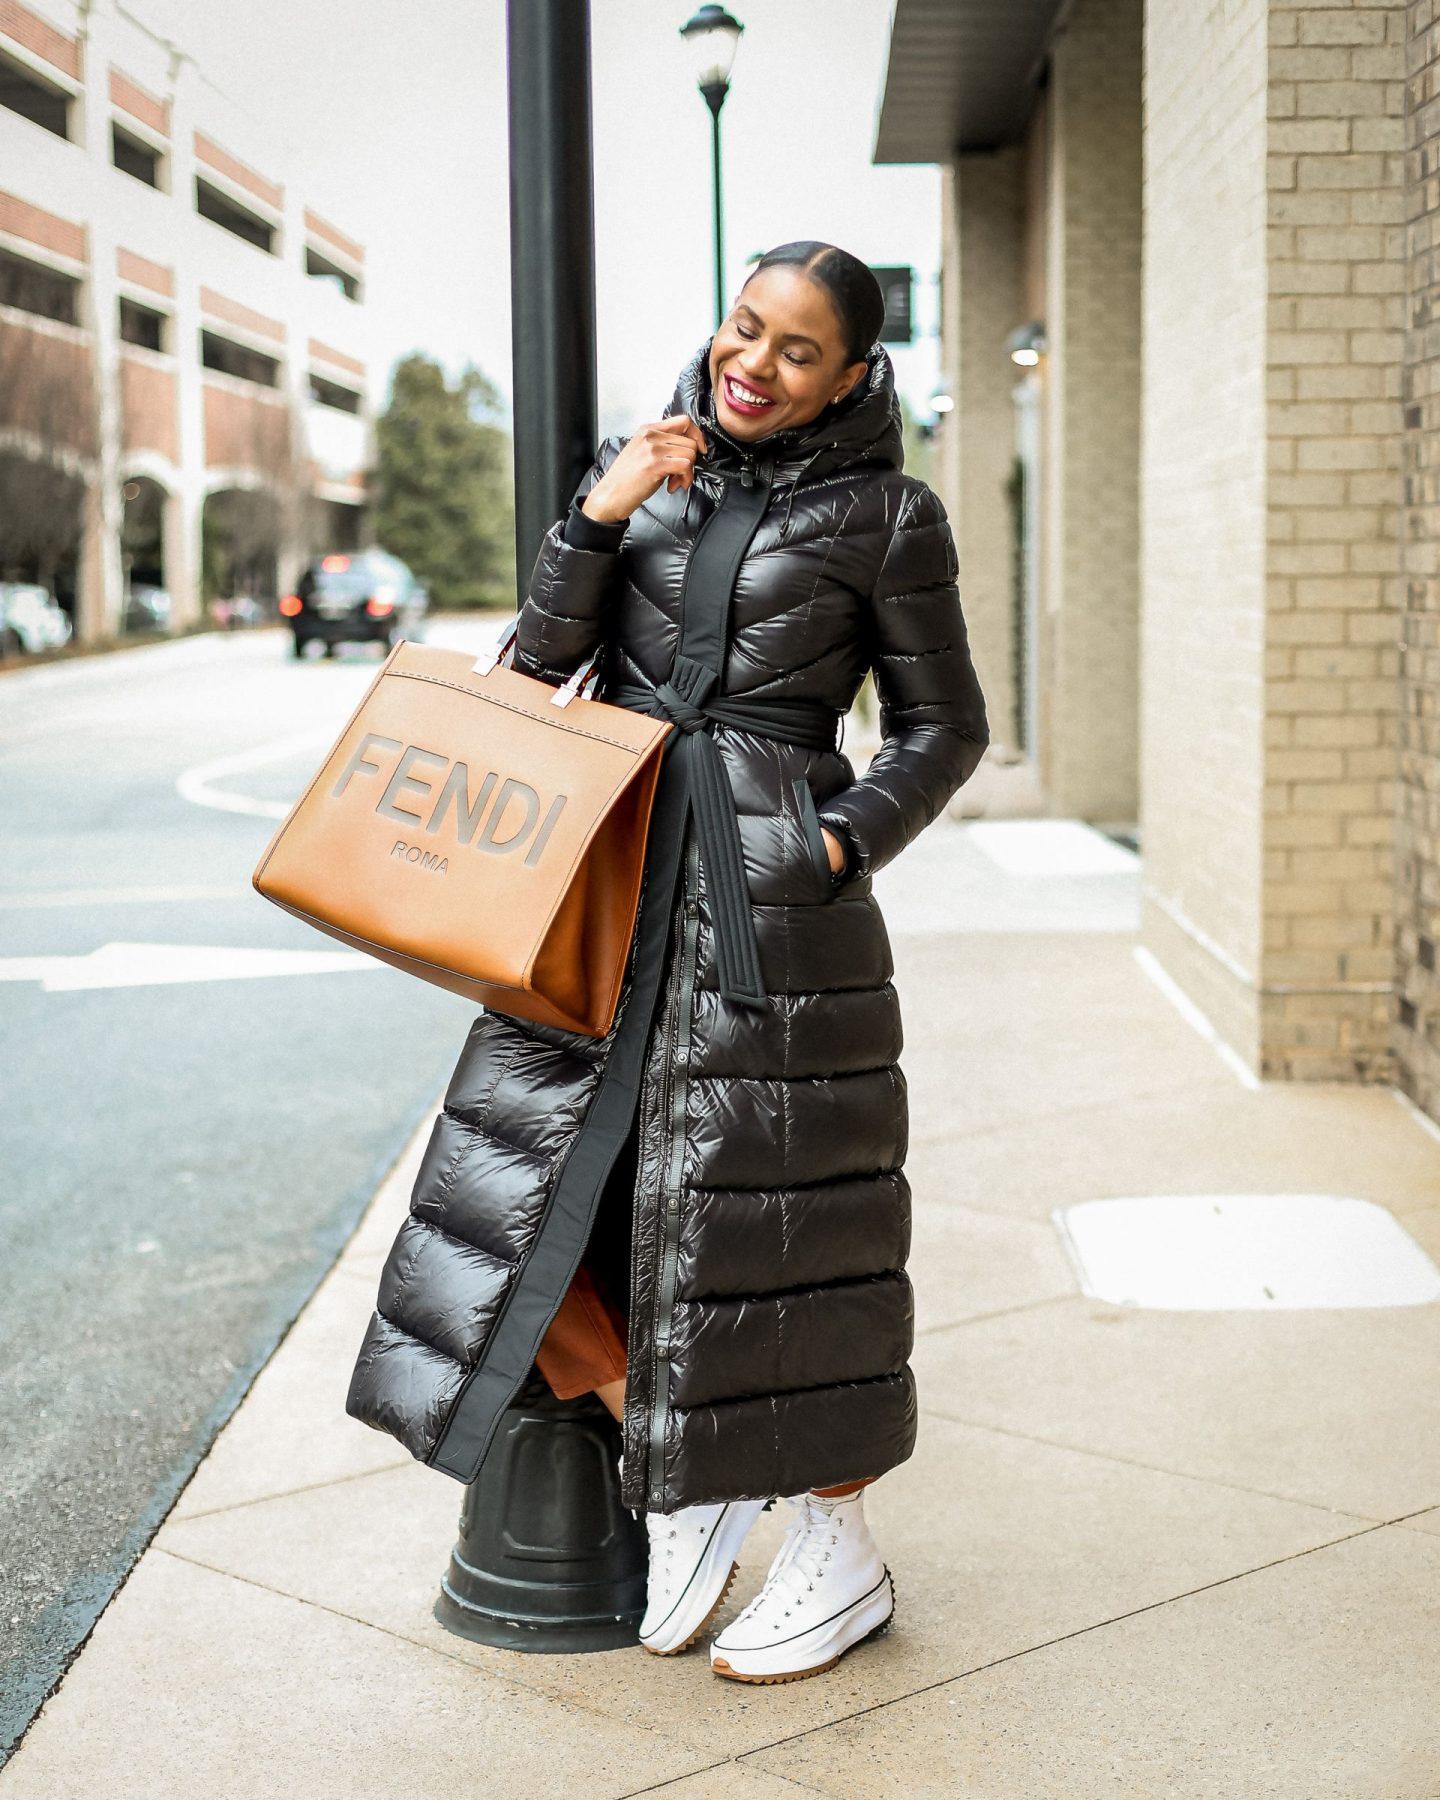 mackage maxi puffer coat, puffer coat, long puffer coat, winter essentials, fendi sunshine tote, converse sneakers converse platform sneakers